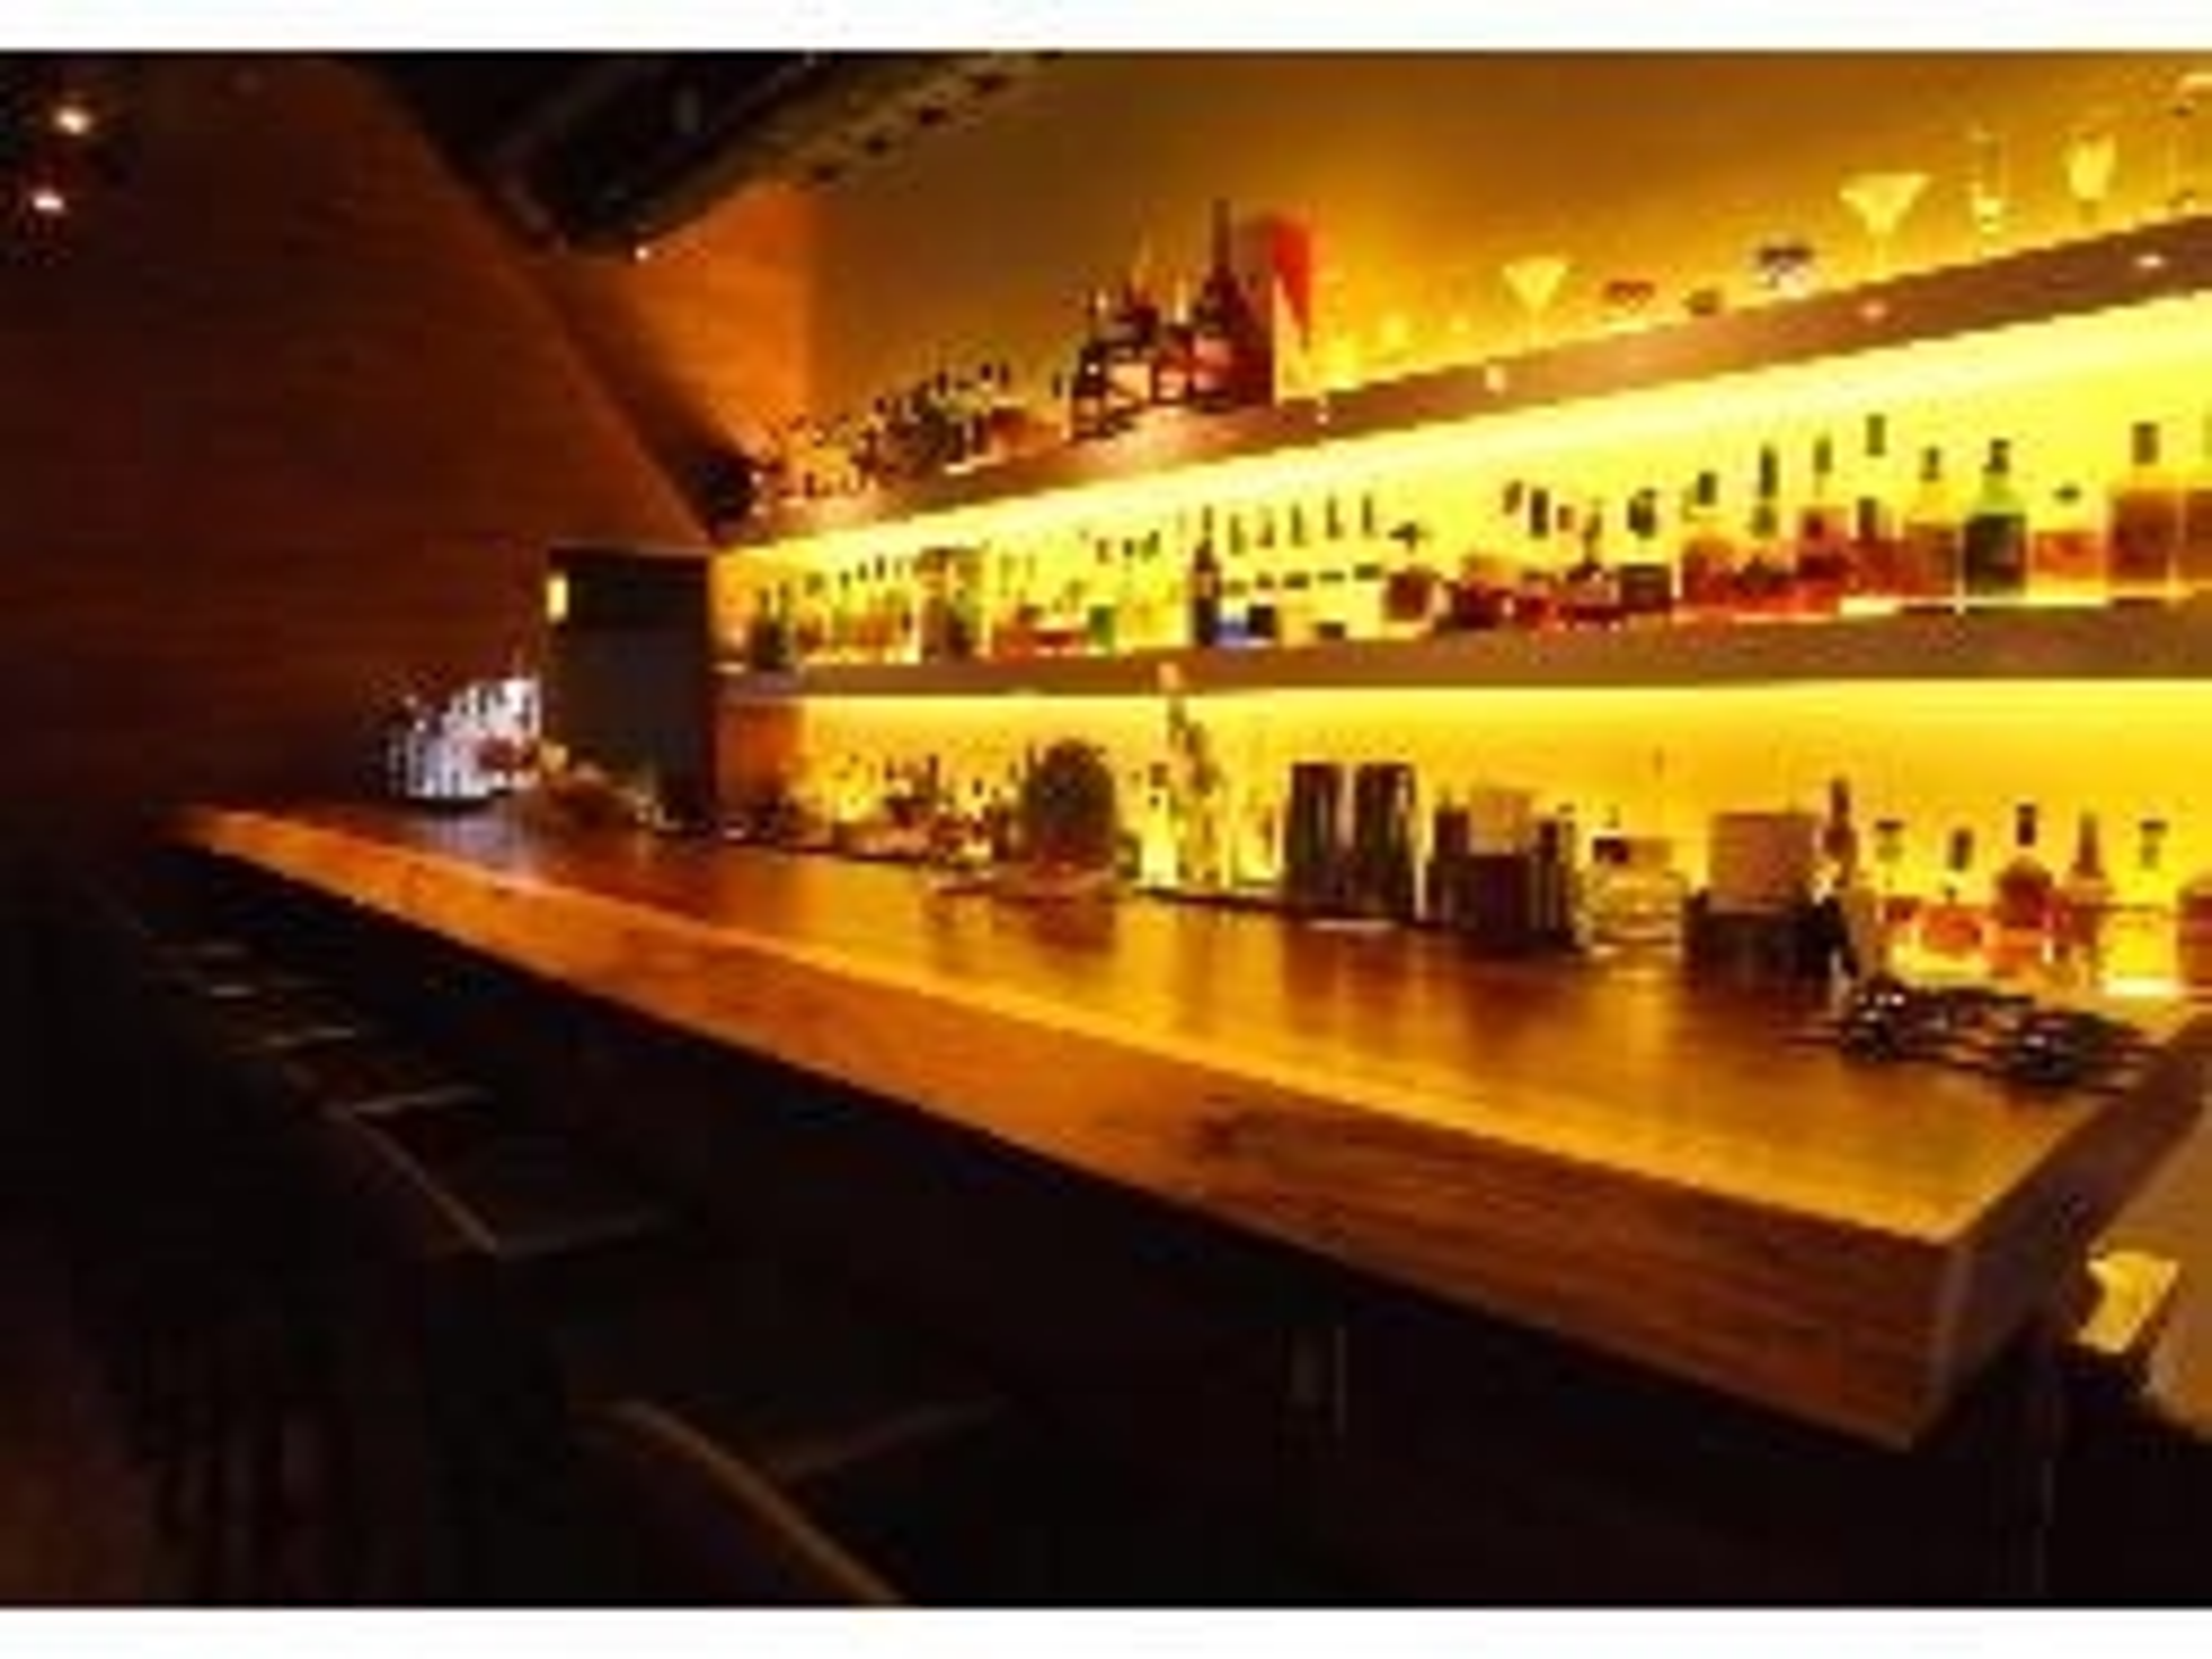 Bar ark